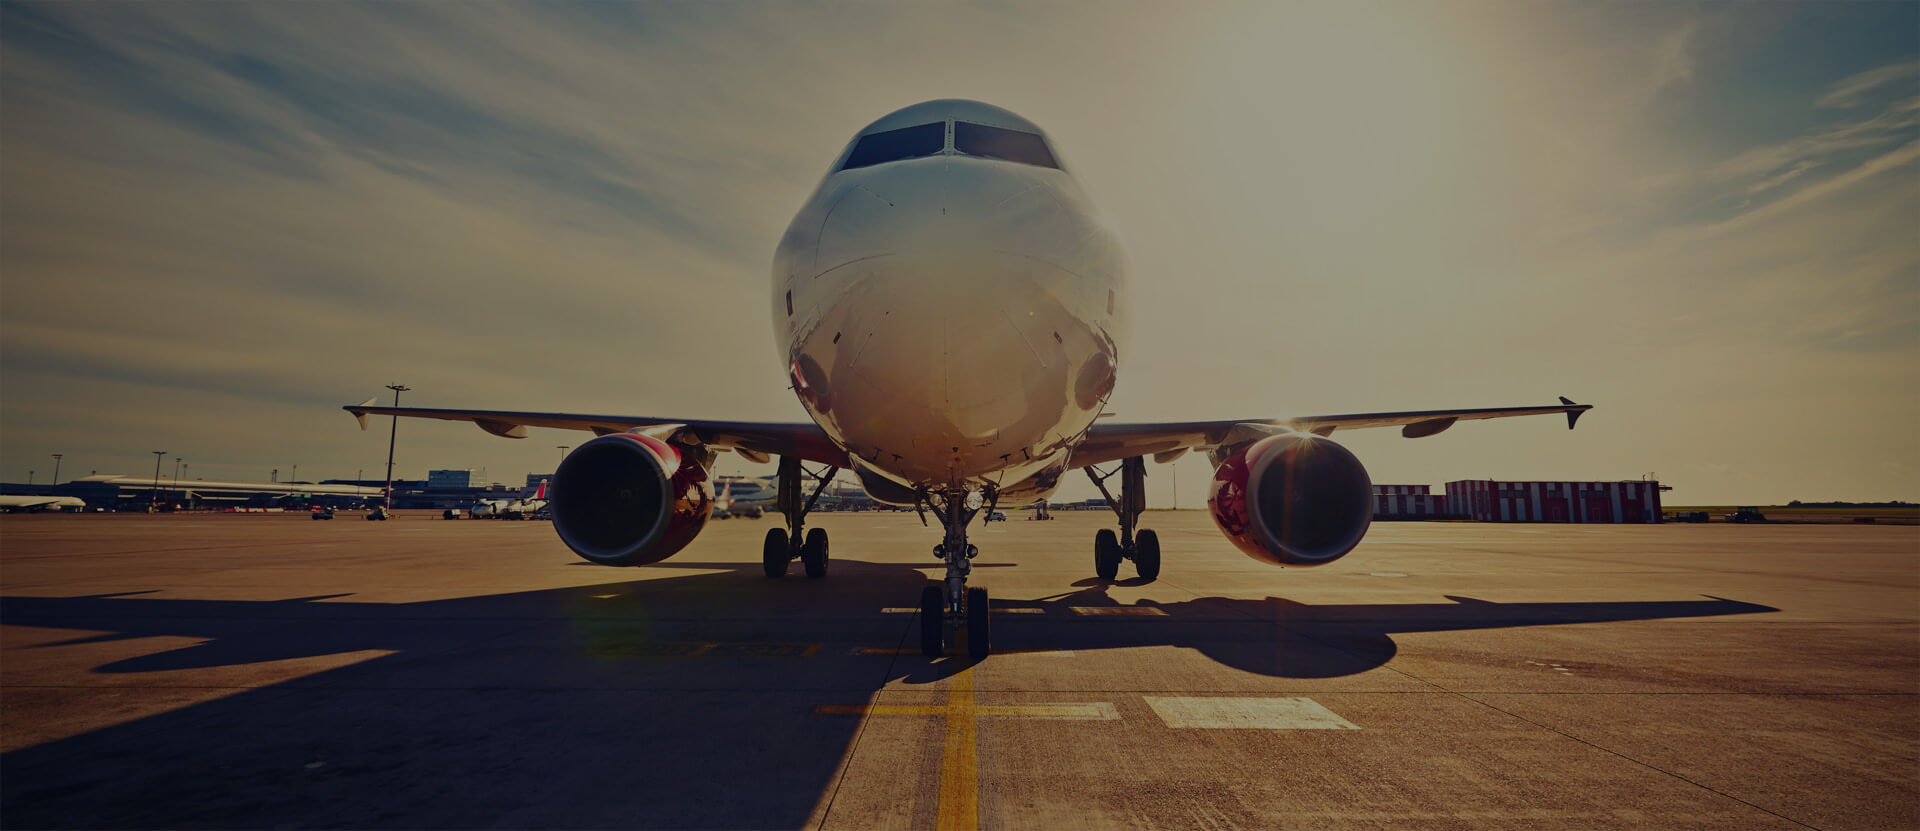 aviation-aerospace-industry-software-system.jpg